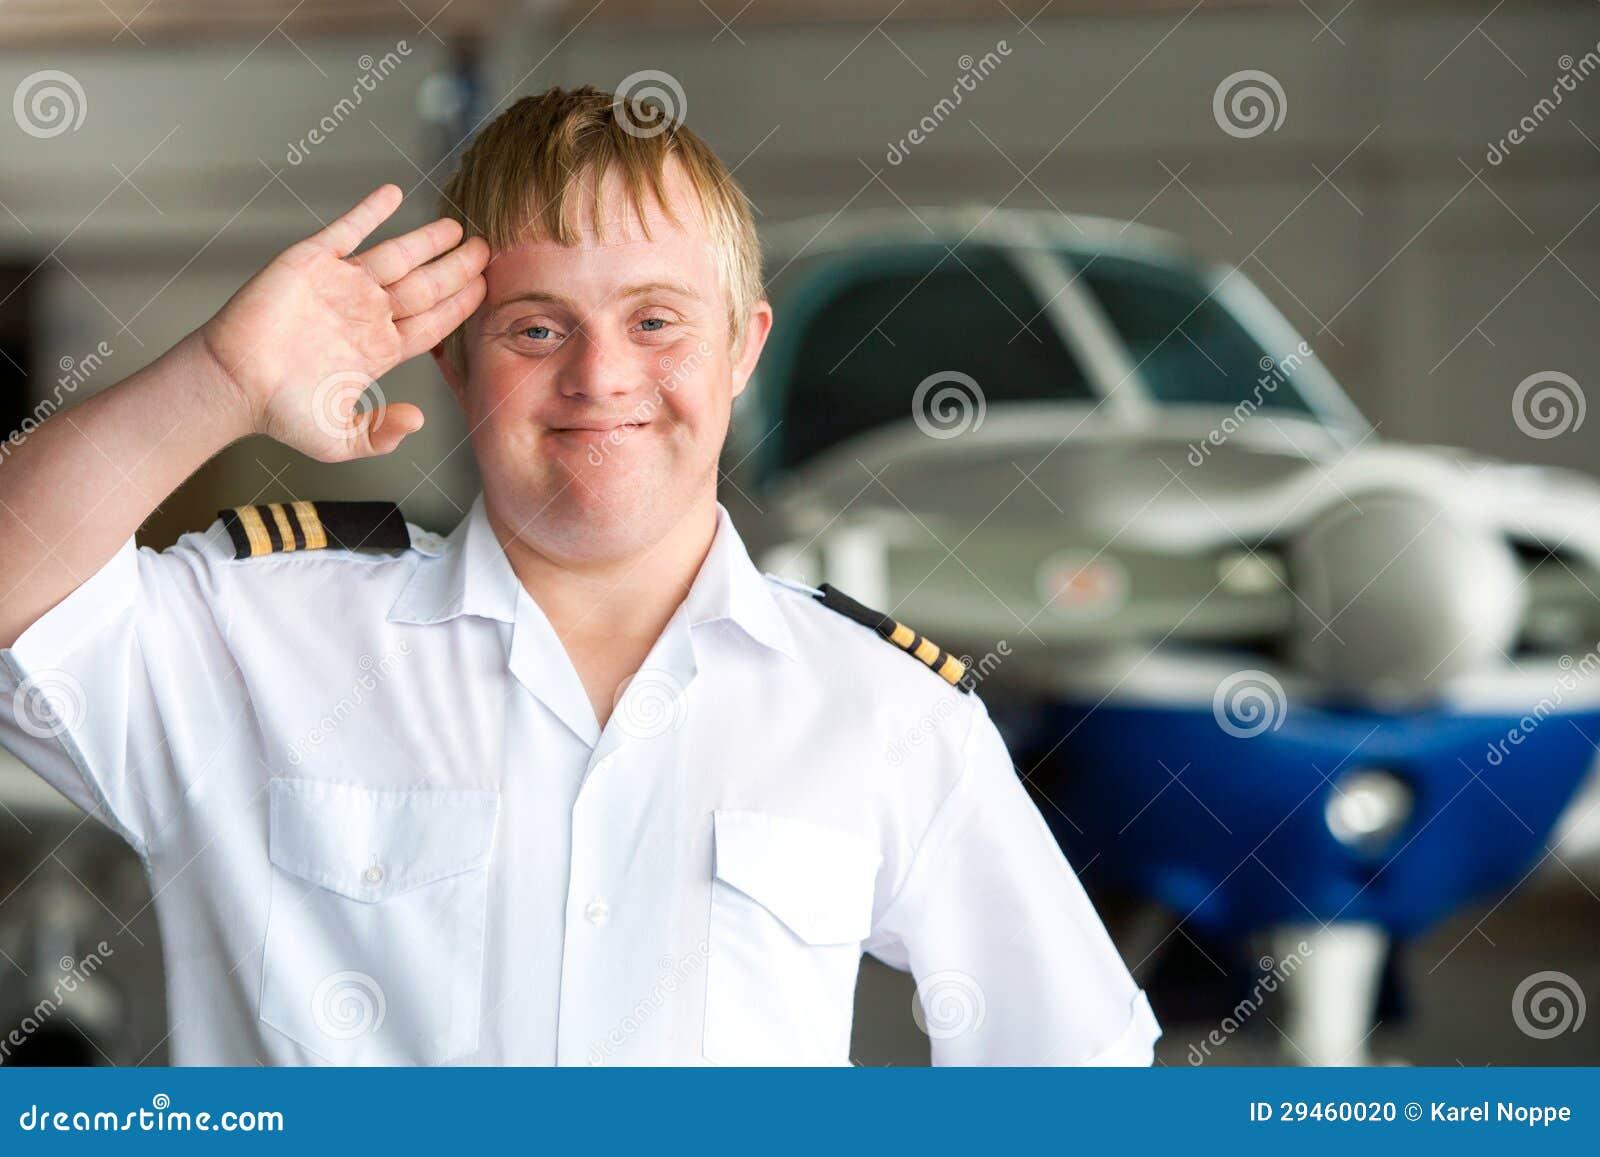 Portret potomstwo pilot z puszka syndromem w hangarze.